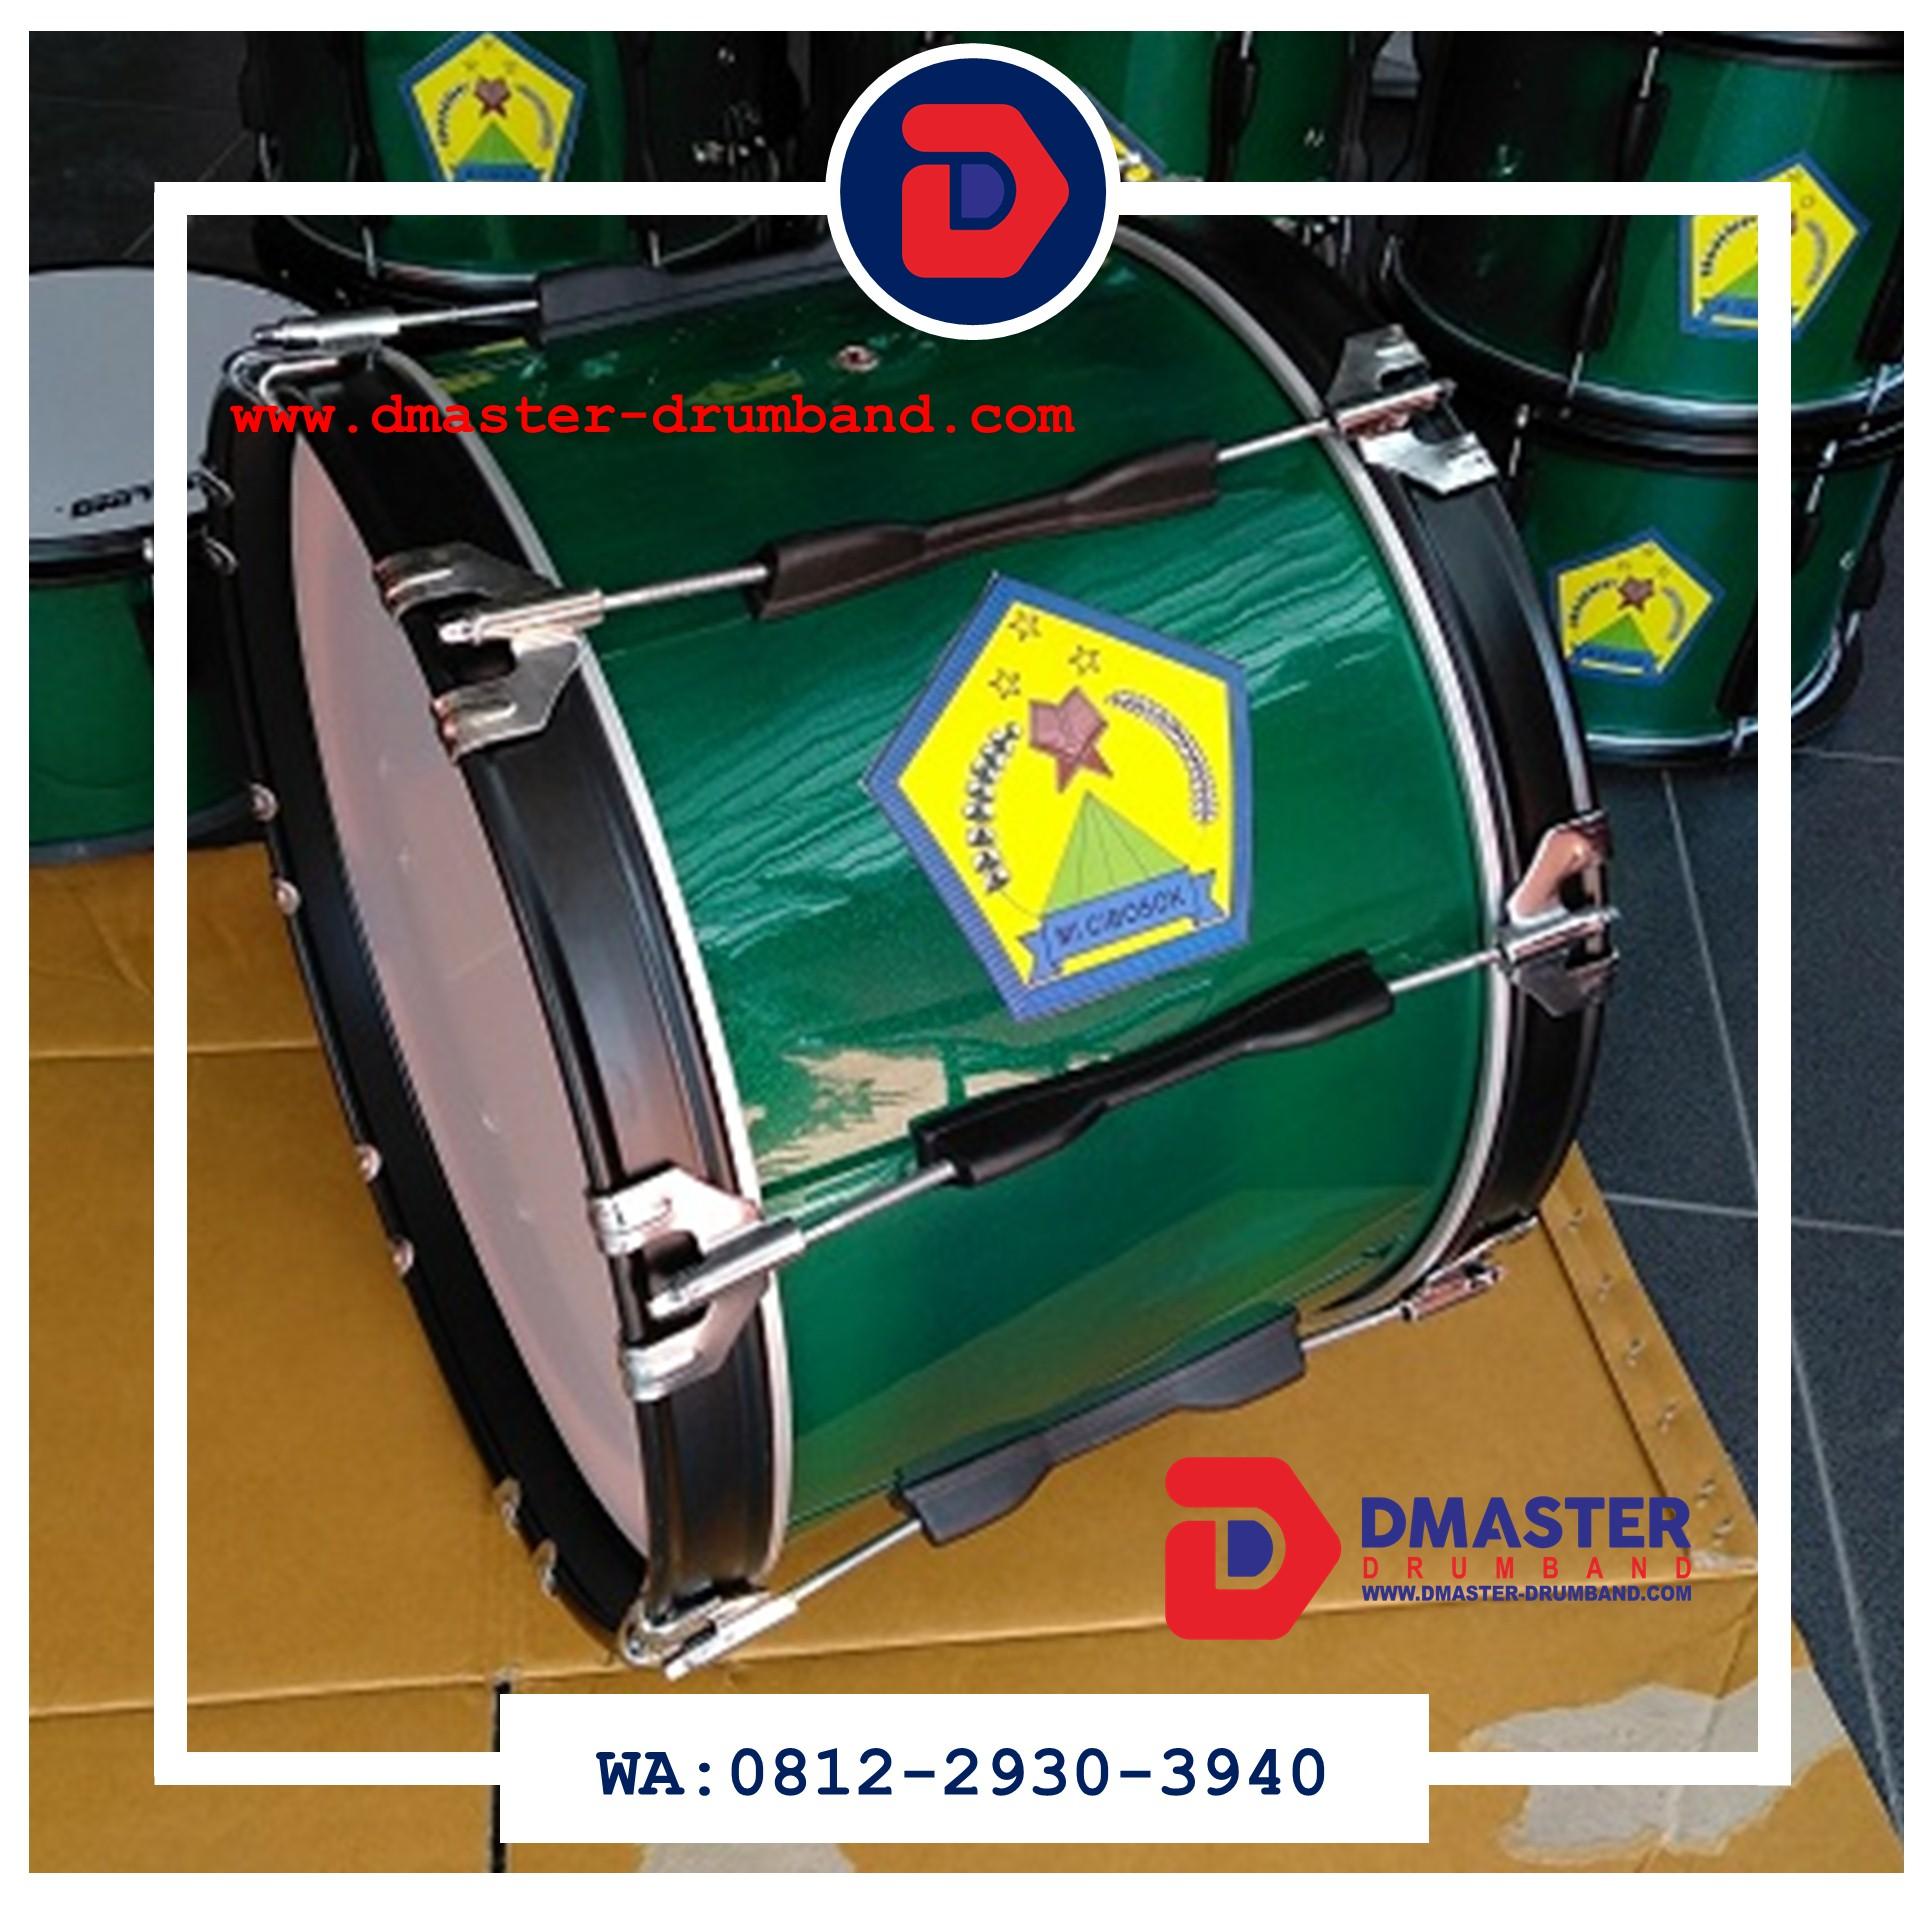 jual drumband premium | dmaster-drumband | wa.0812-2930-3940